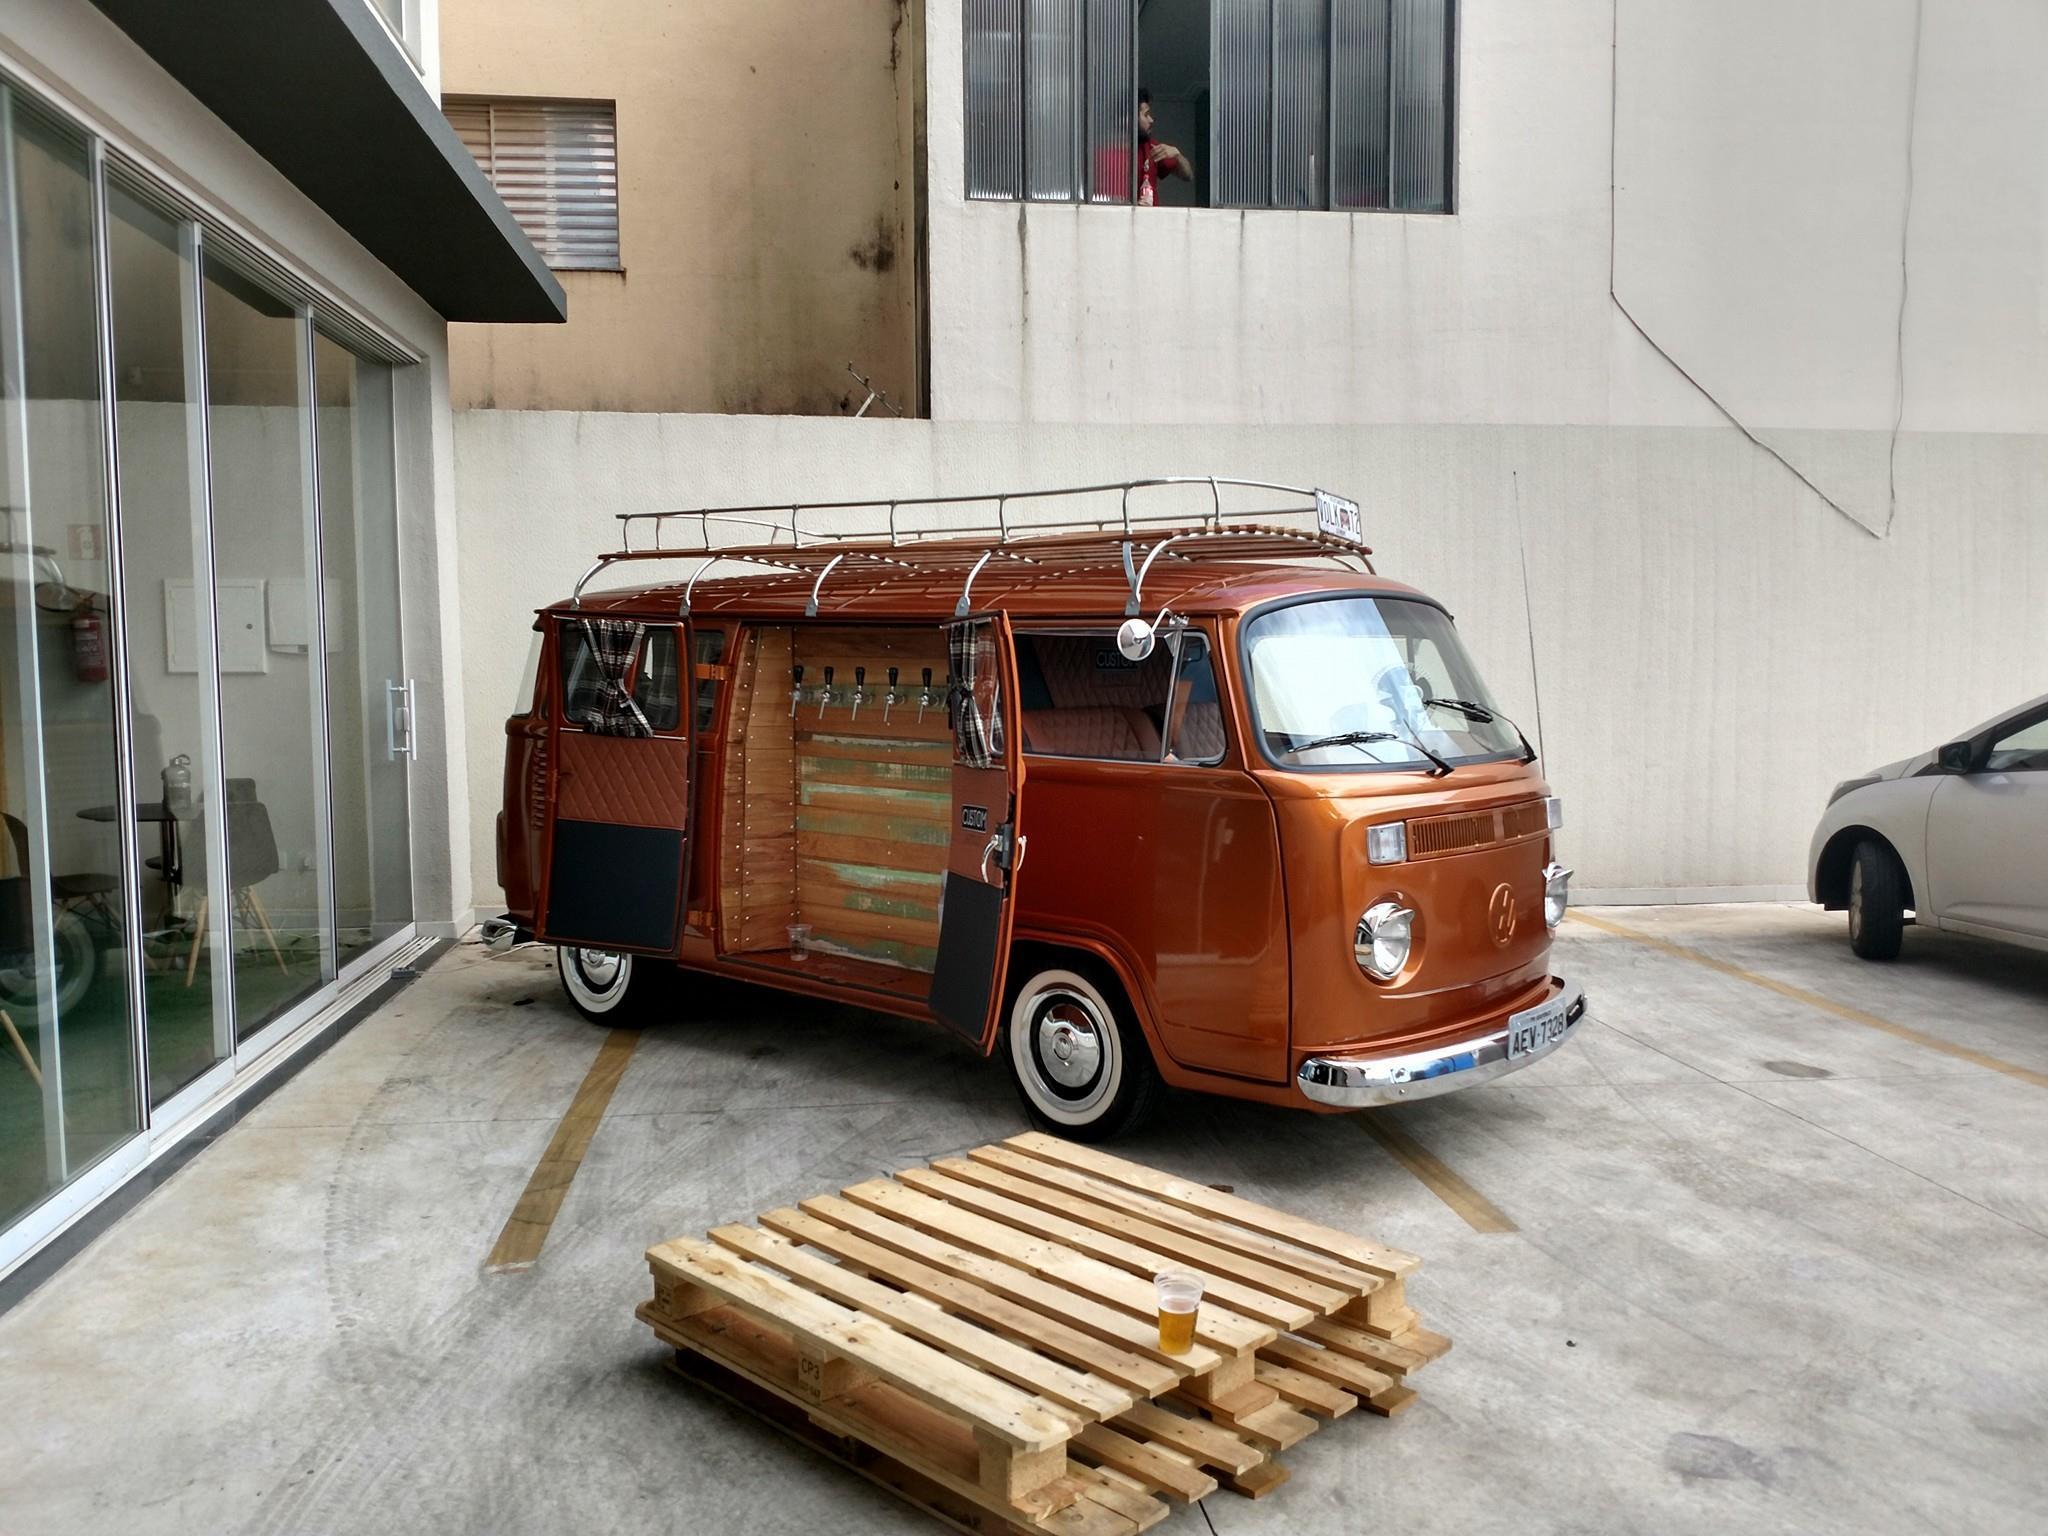 Beer truck / Food truck / Kombi beer / Campinas /Chopeiras